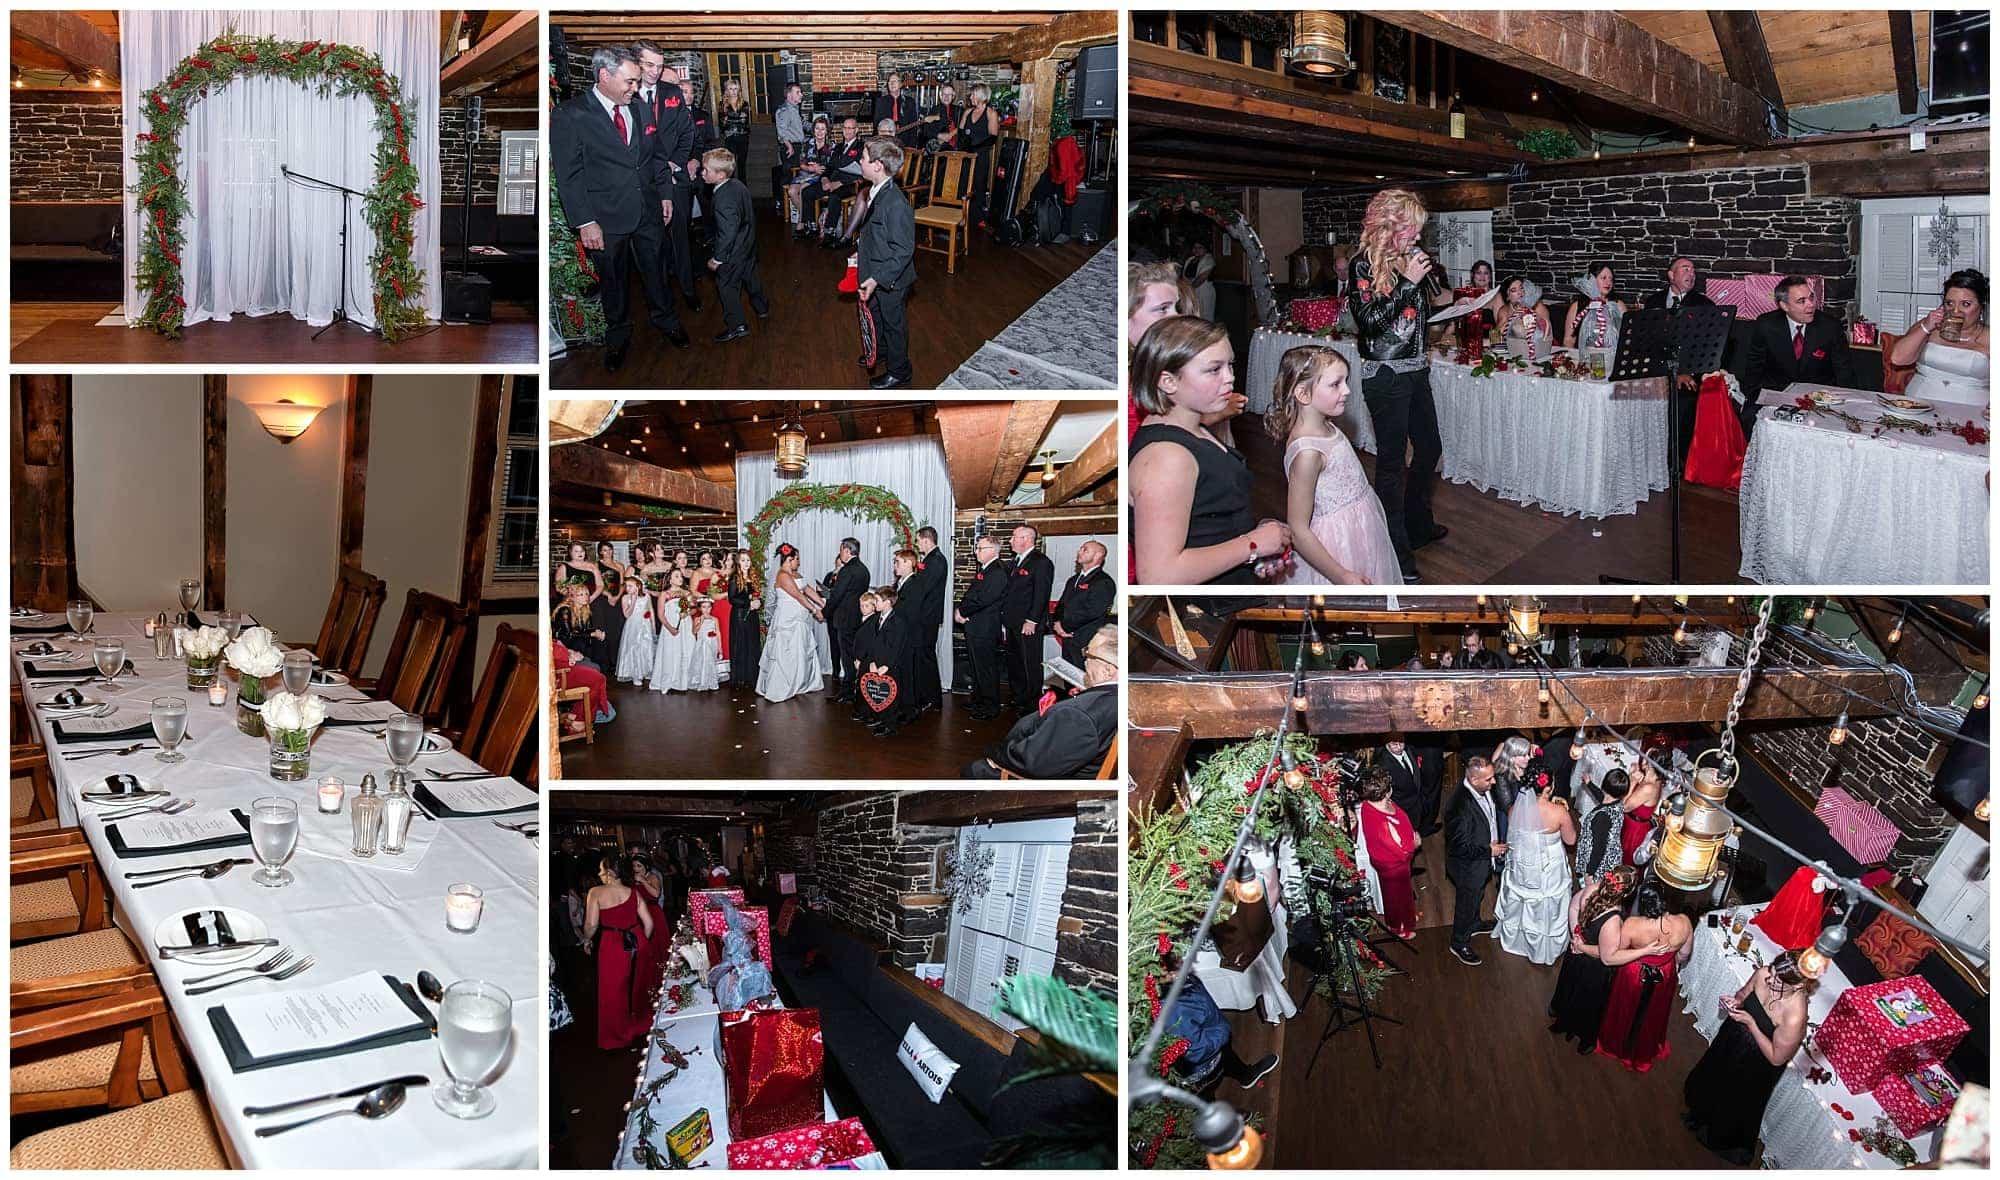 Lower Deck Tap Room weddings, barn style wedding venue in Halifax.